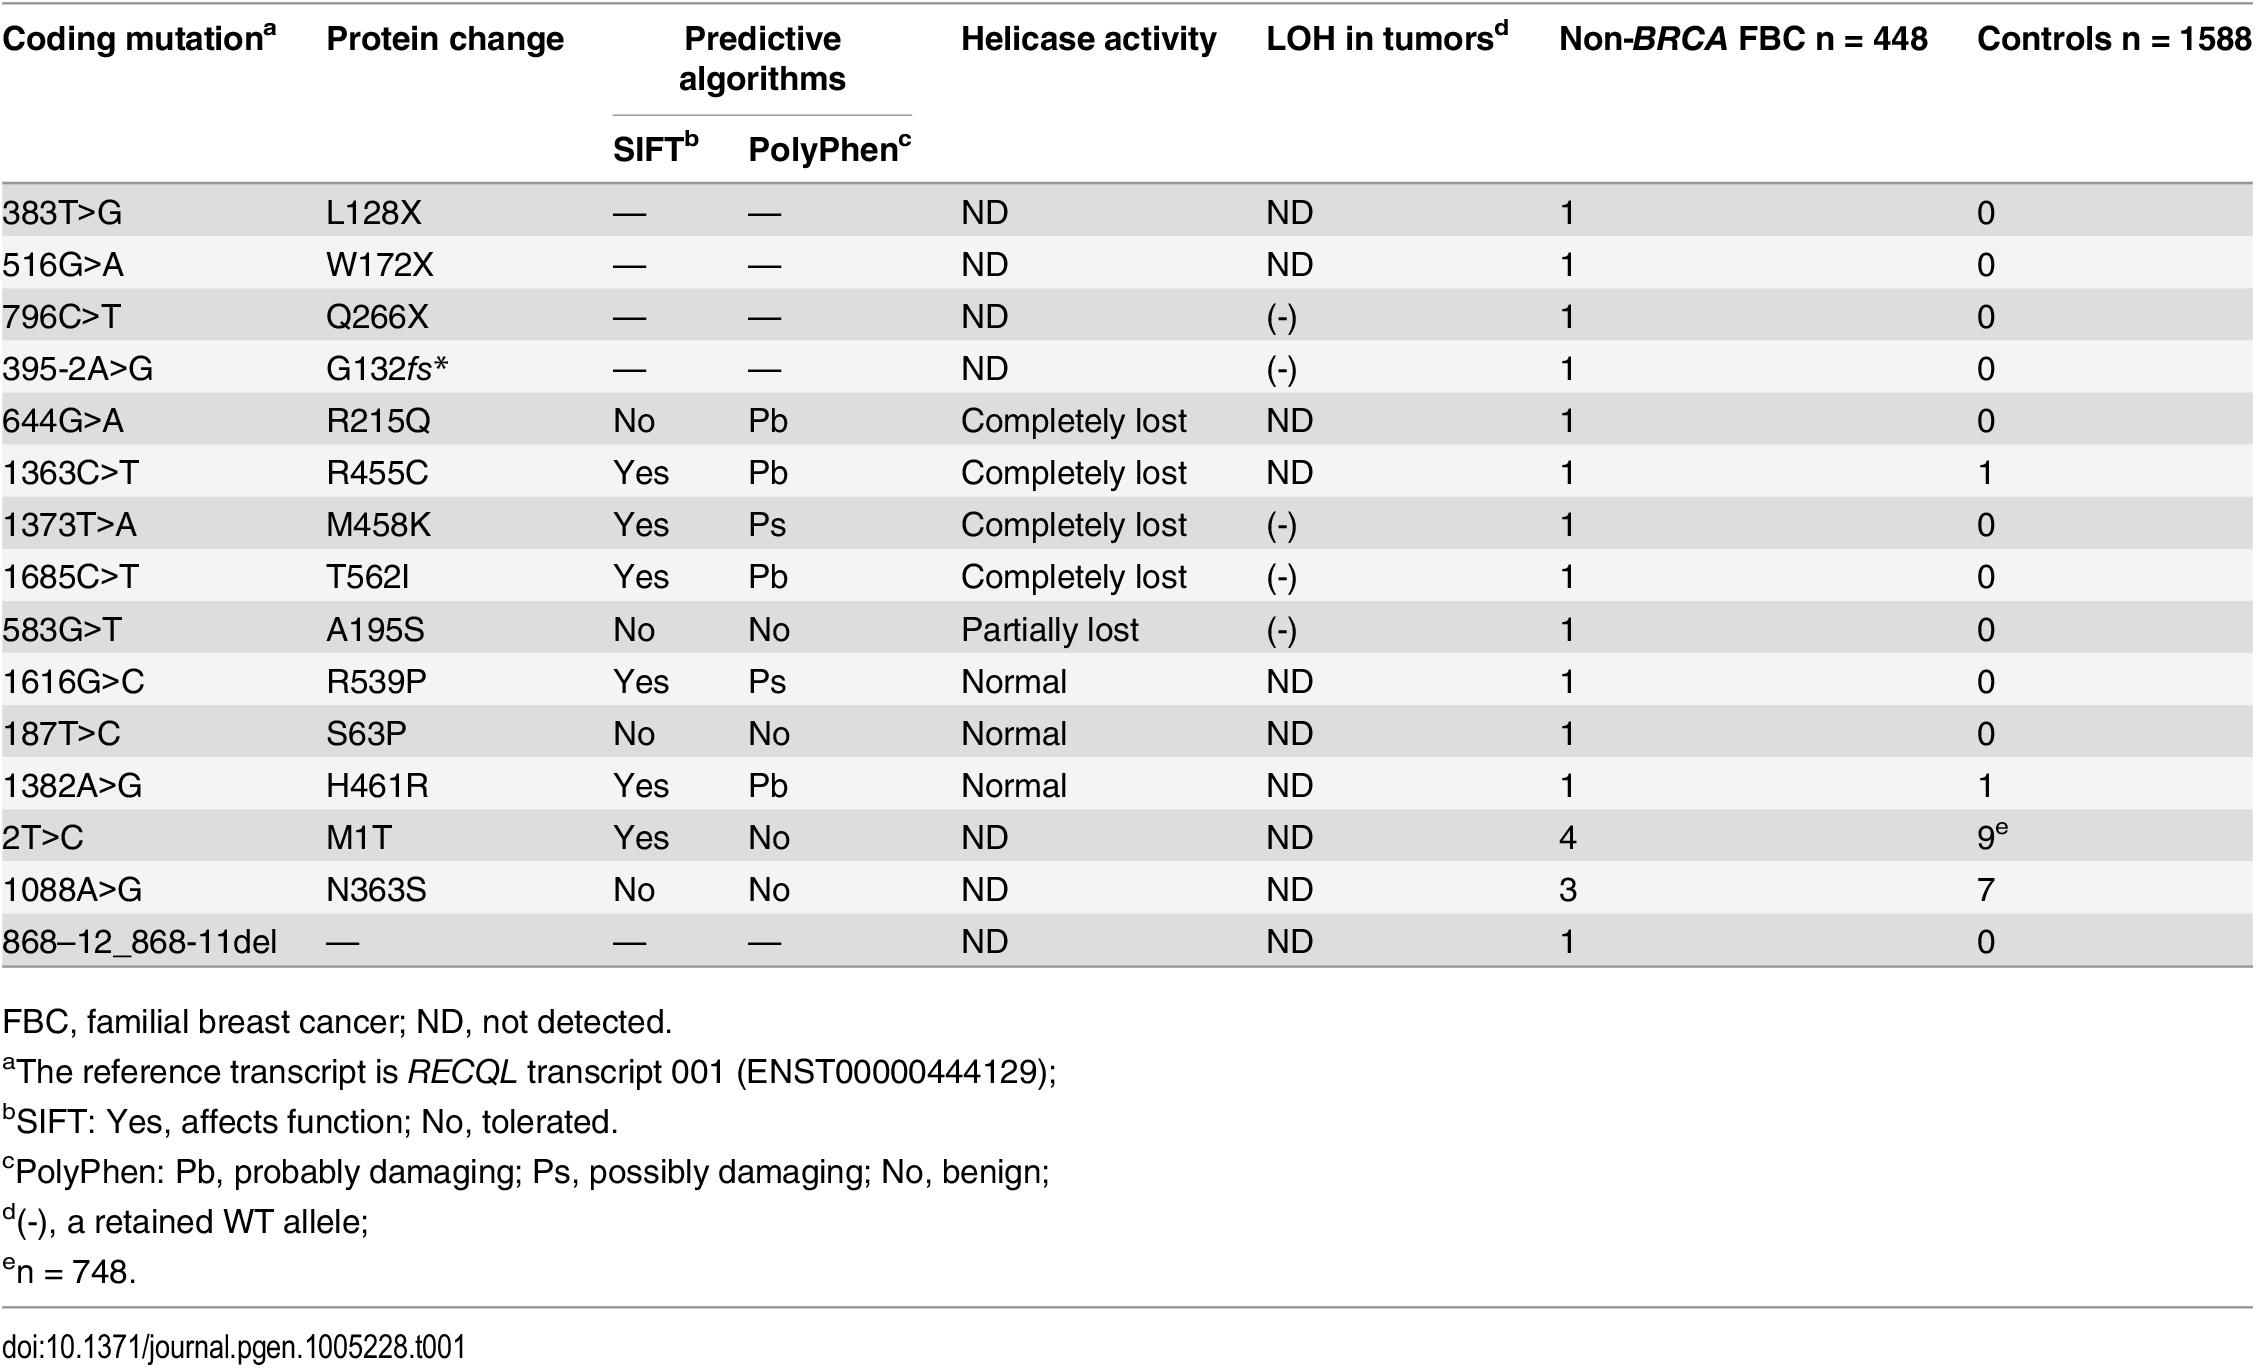 Mutations in <i>RECQL</i> gene identified in the 448 <i>BRCA1/2</i>-negative familial breast cancer patients.